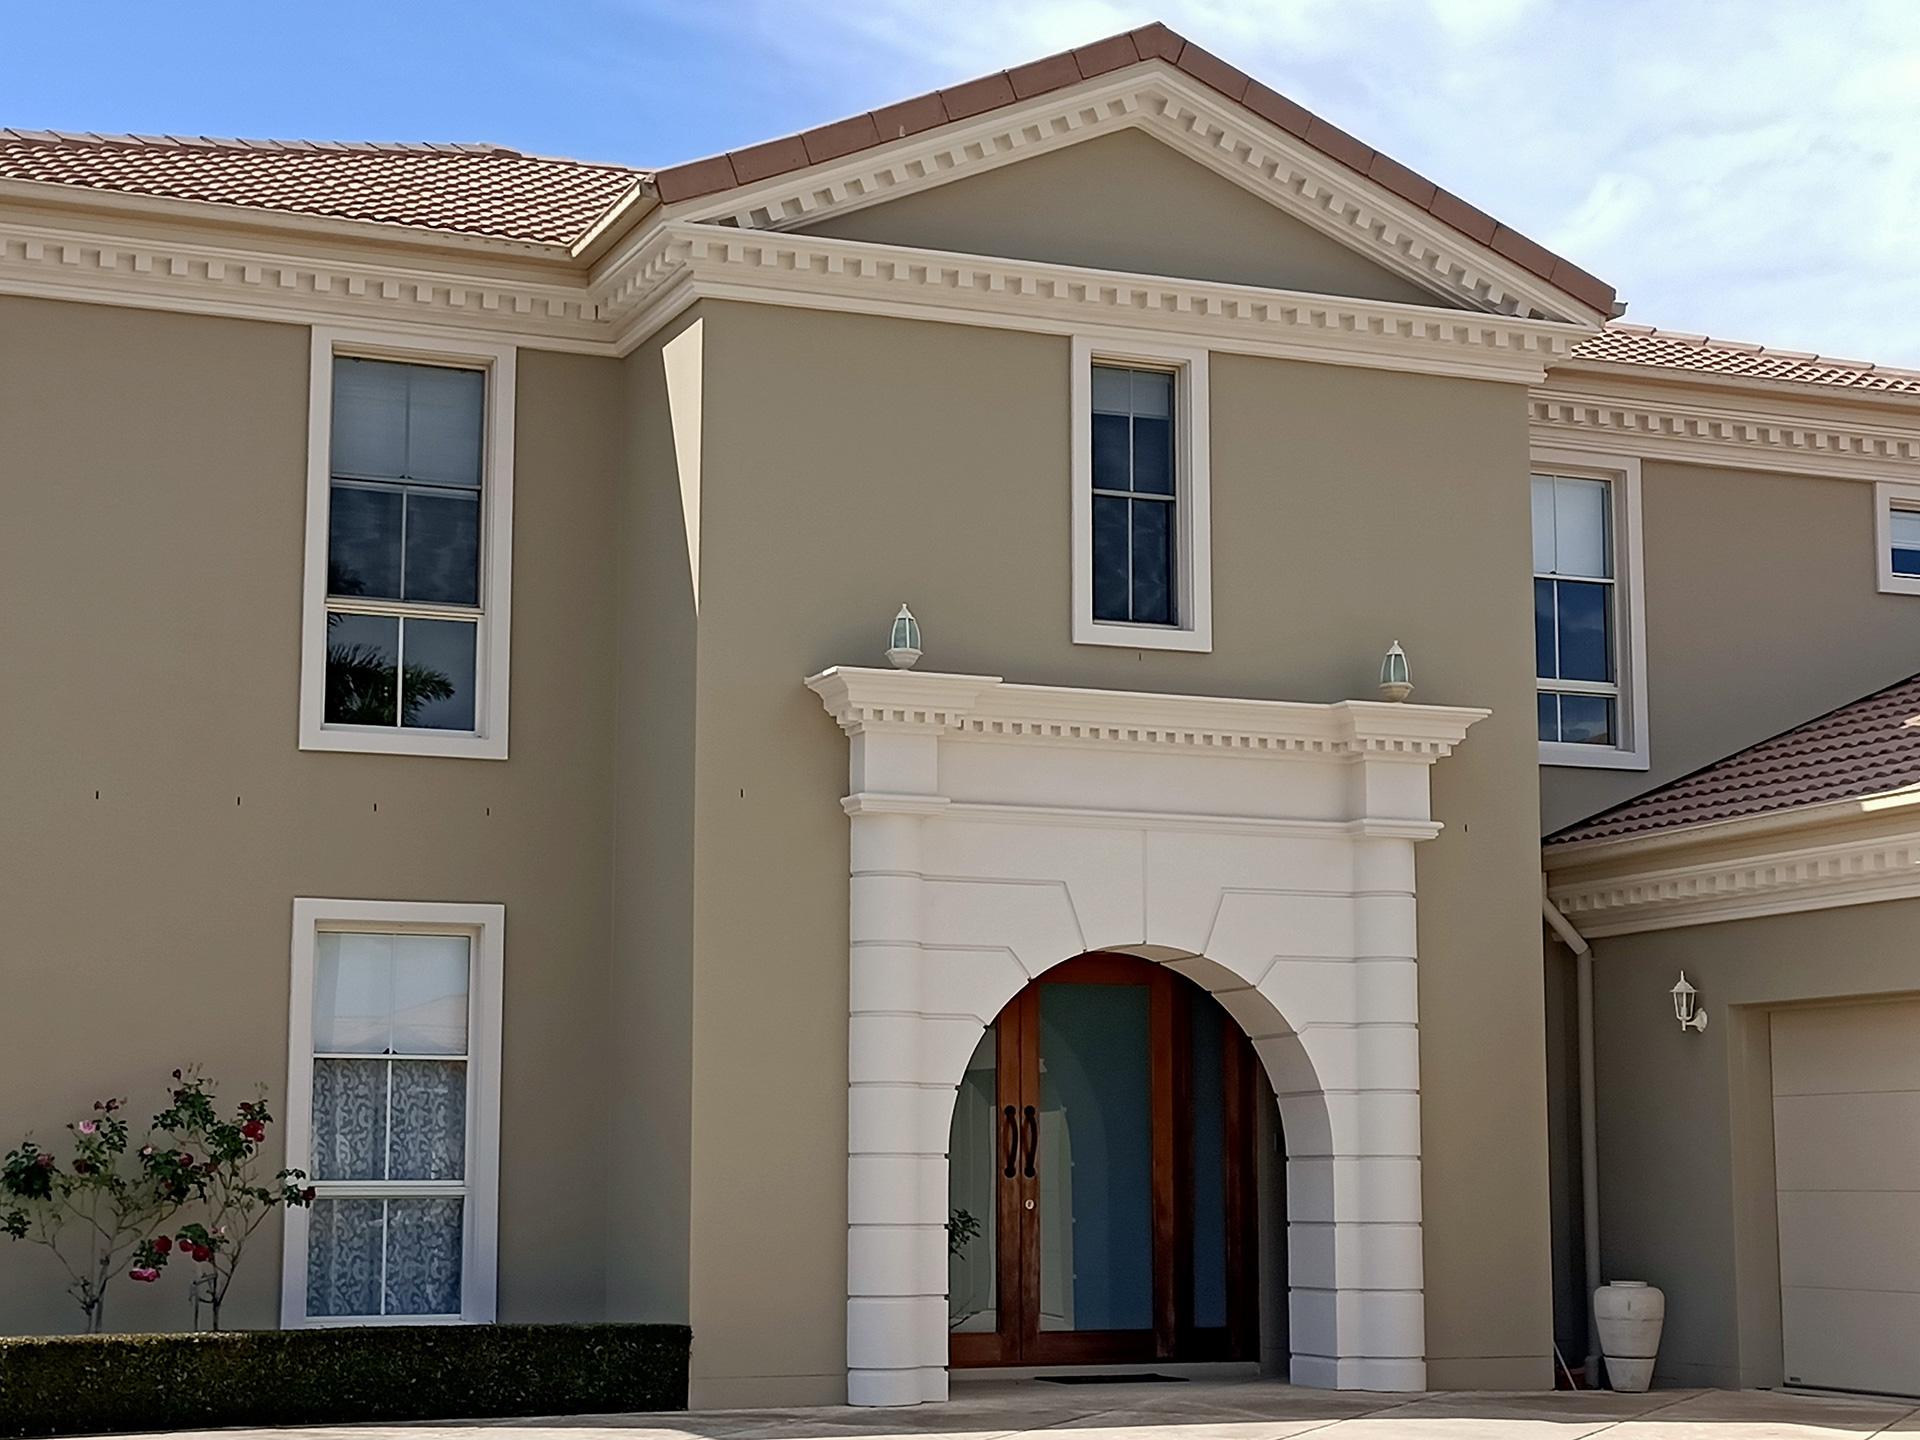 grand building entrance doorway facade gold coast Australia